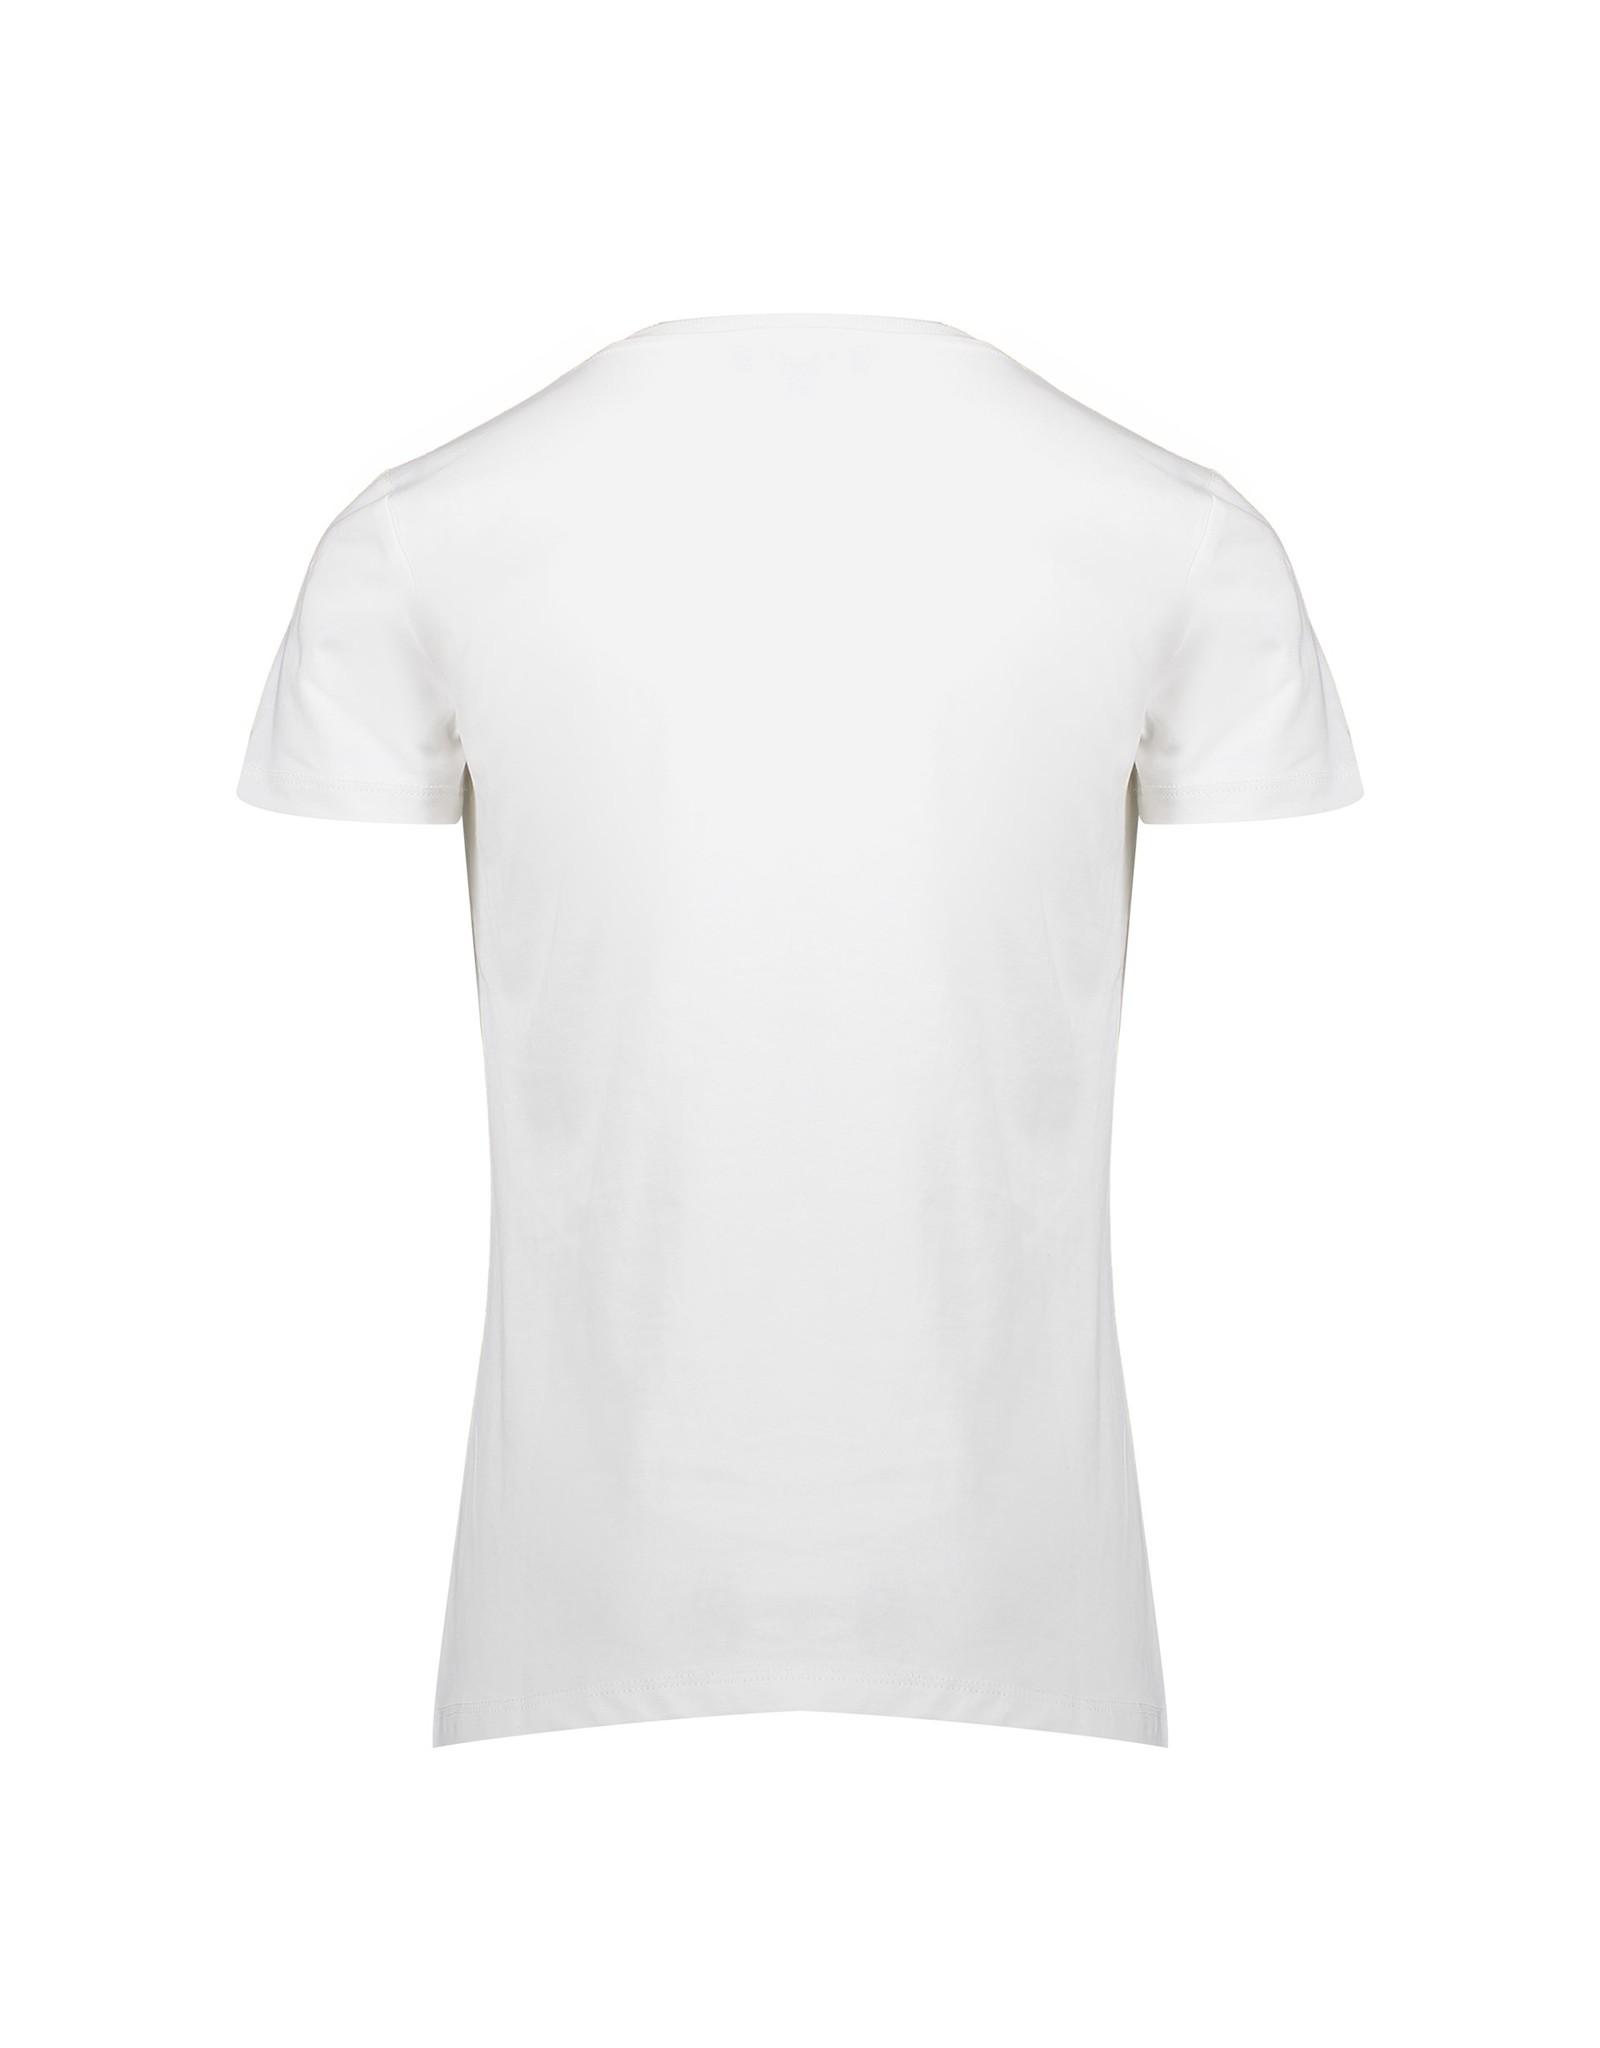 "Geisha T-shirt ""leopard"" round circle s/s"